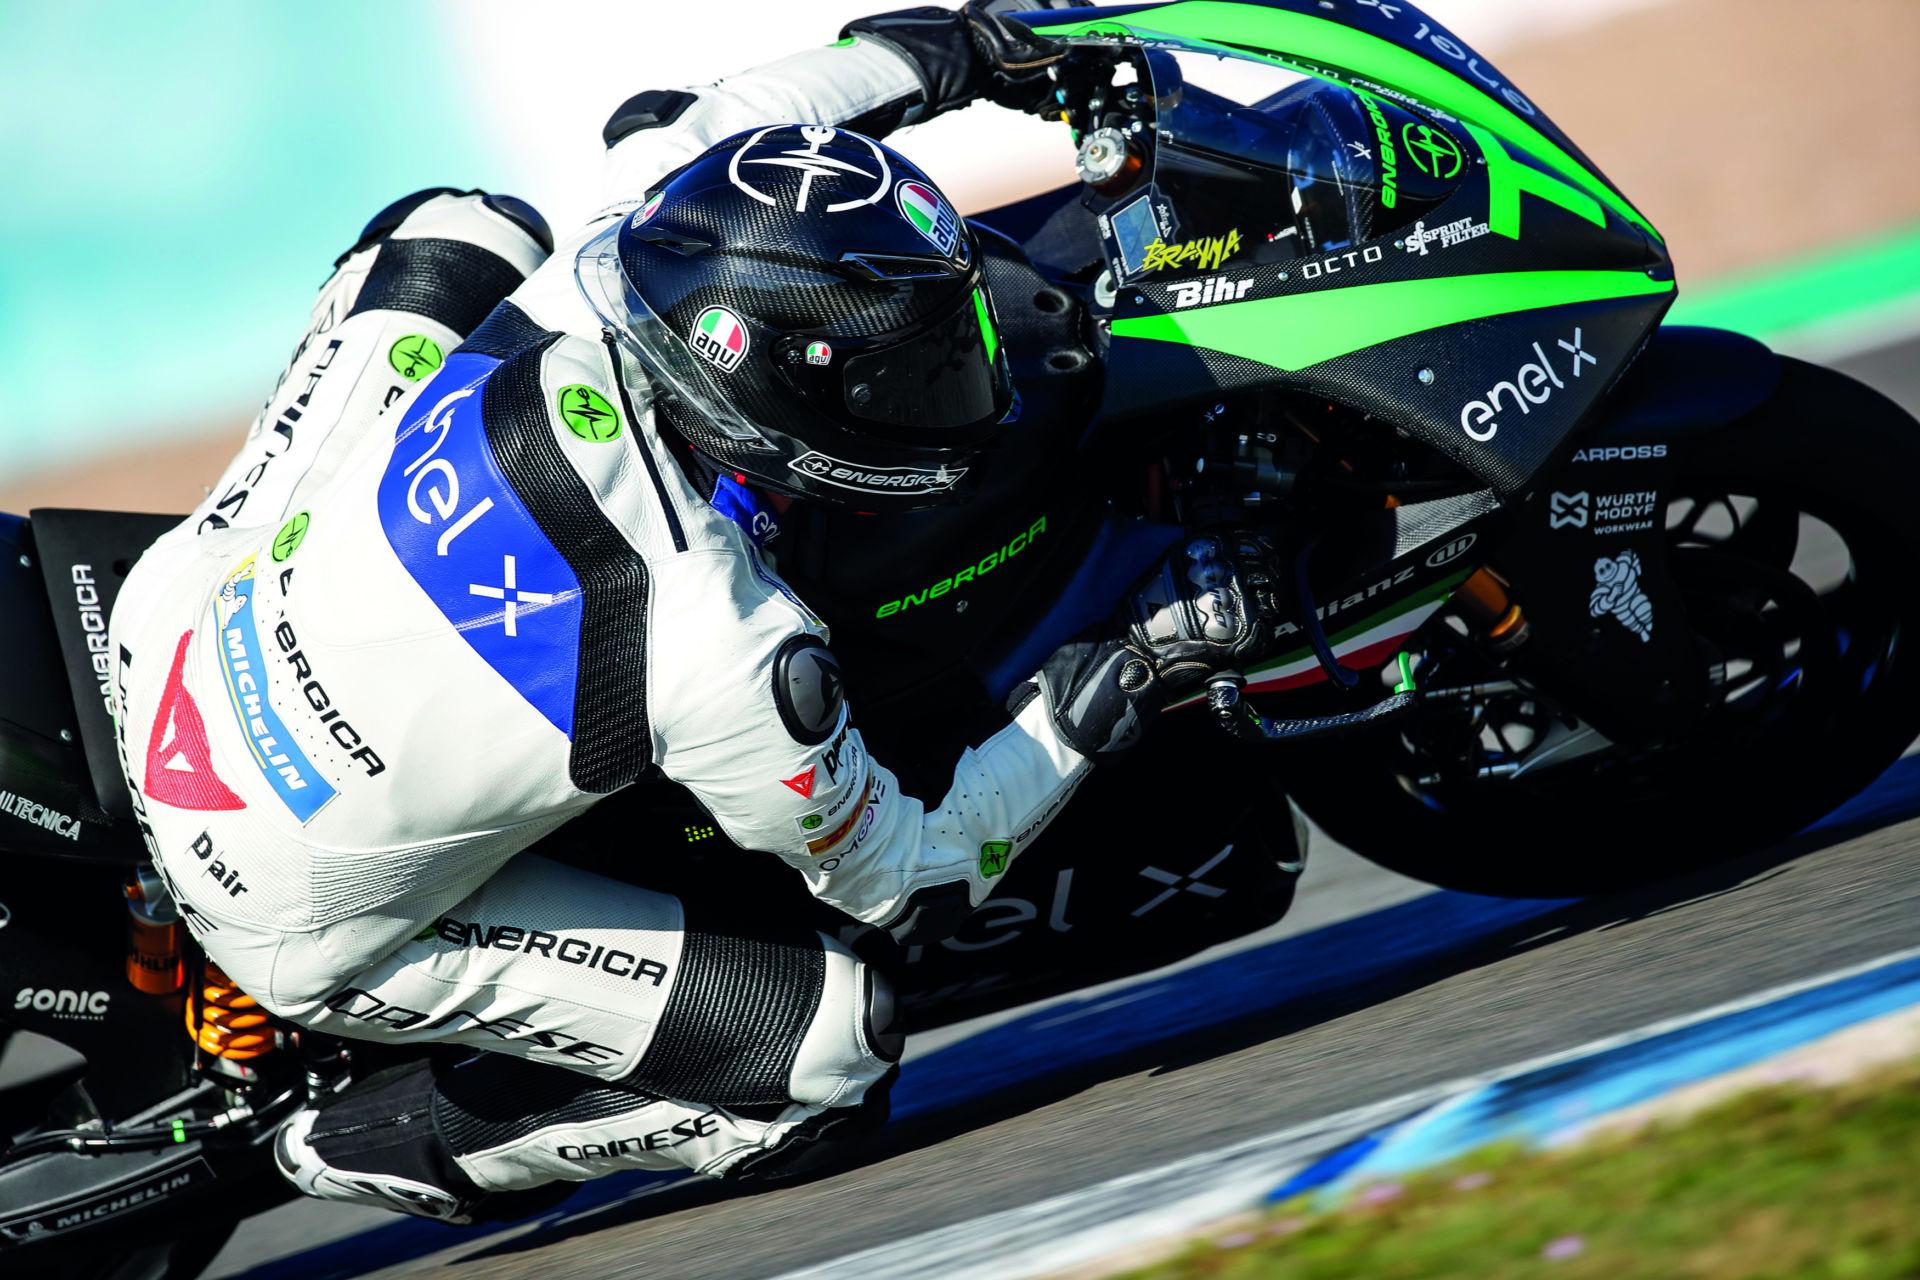 An Energica test rider on an Energica Ego Corsa electric racebike. Photo courtesy Energica.